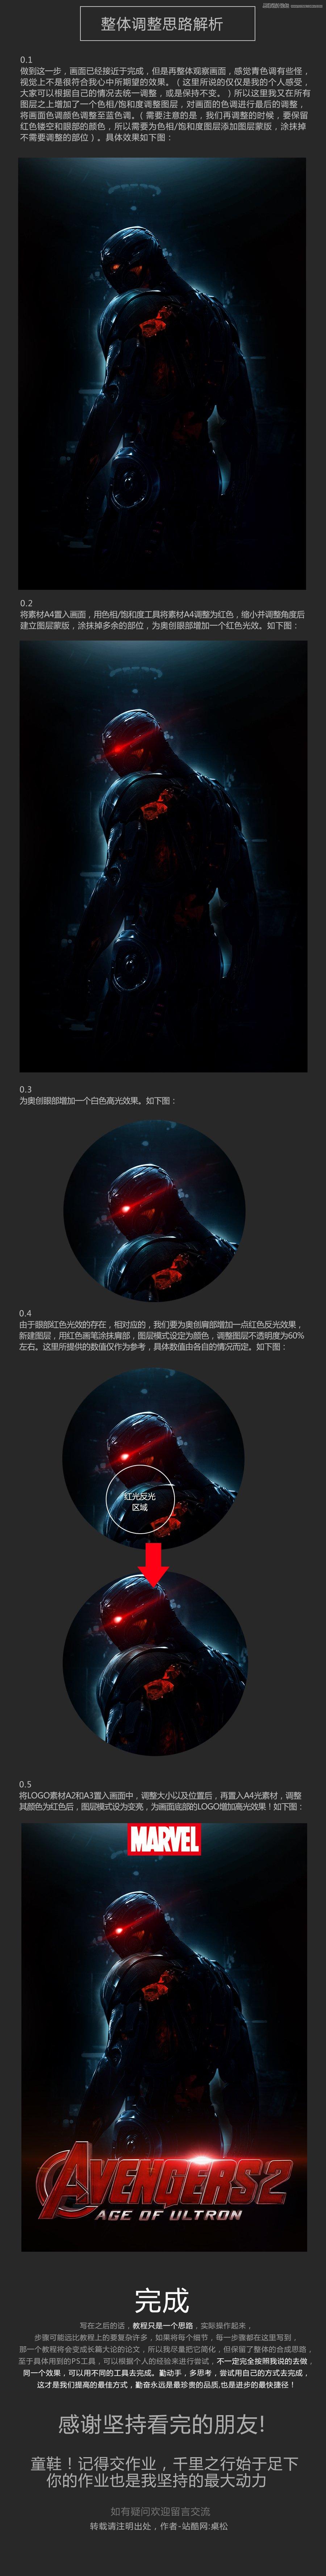 photoshop合成以奥创为主元素的复联2电影海报